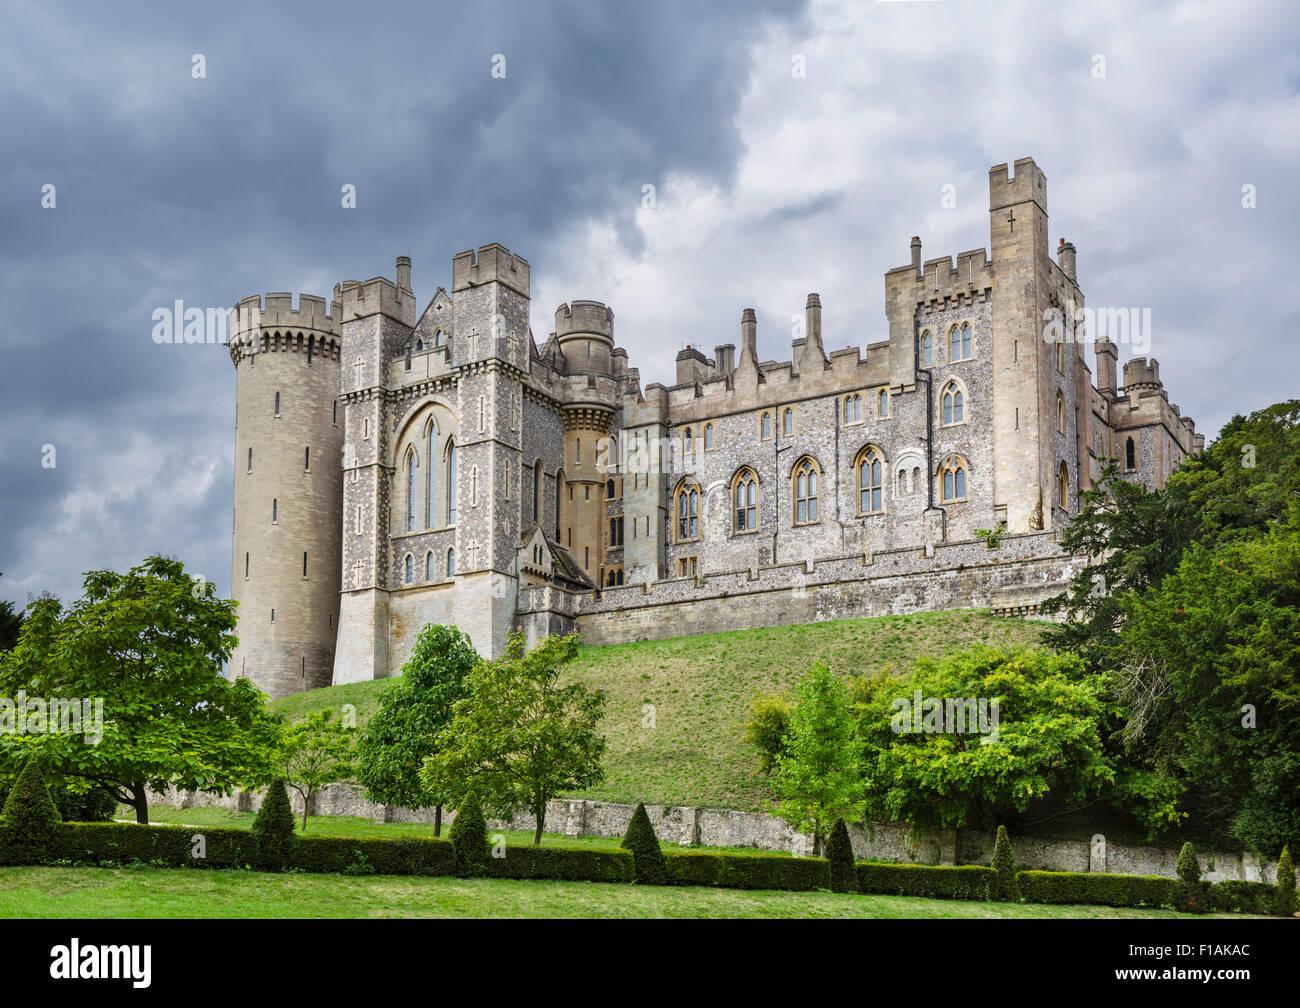 Arundel Castle, Arundel, West Sussex, England, UK - Stock Image